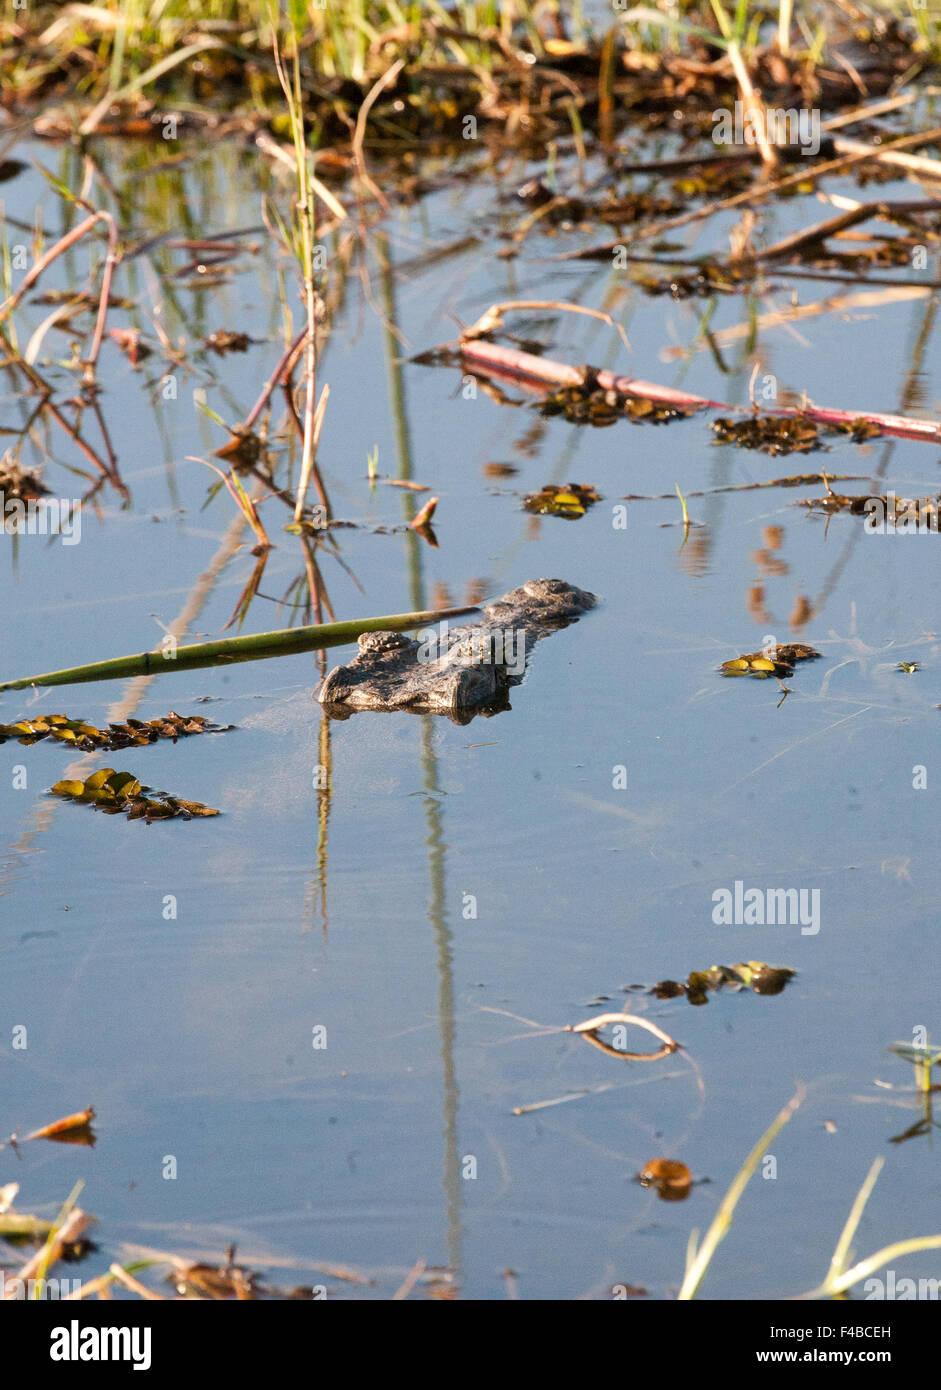 Crocodile in water, Botswana, Africa Stock Photo